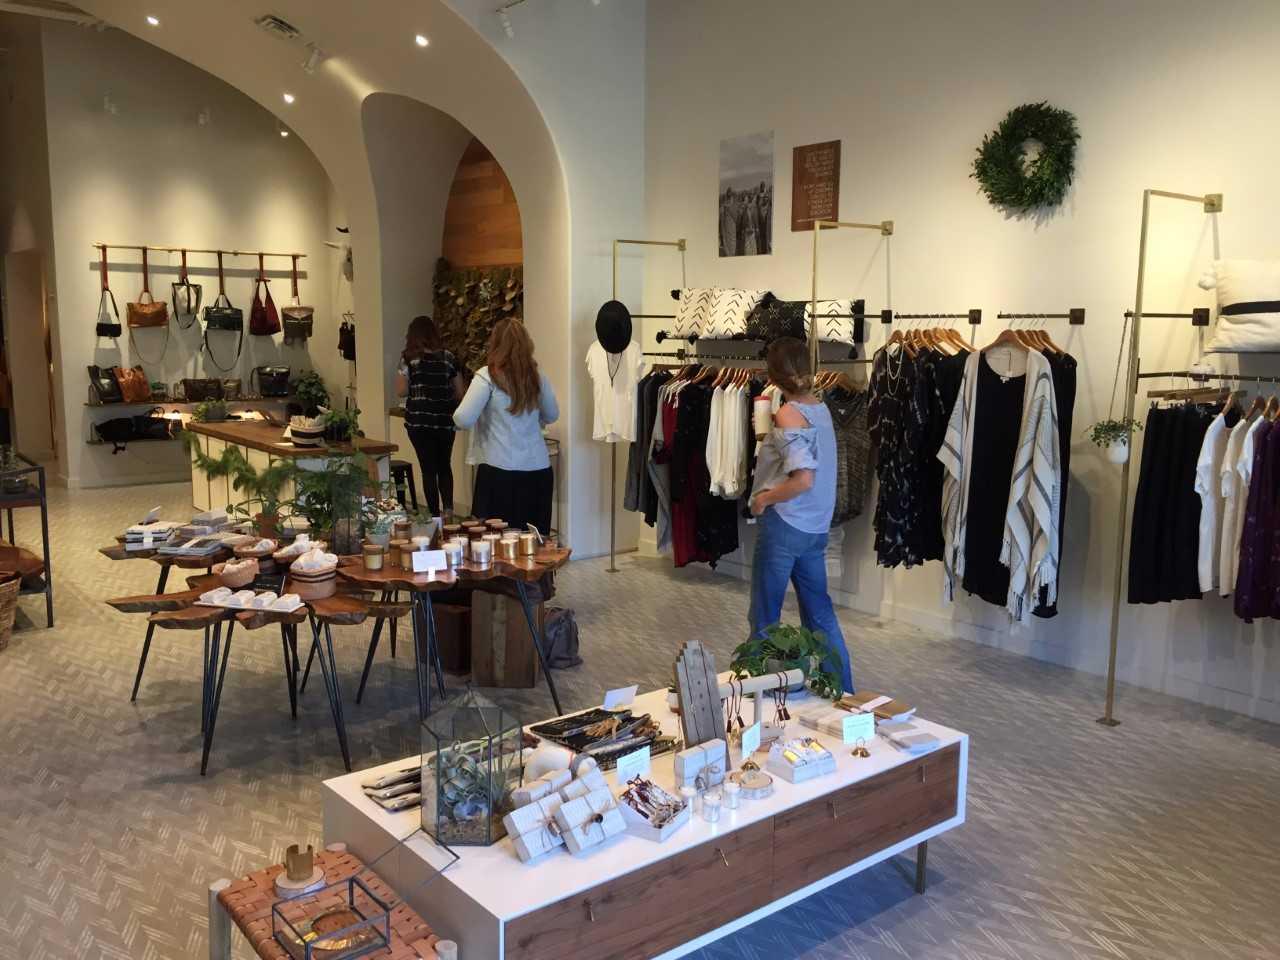 Small Business Saturday shoppers November 25, 2017 (KXAN Photo_Kyle Kovilaritch)_586902